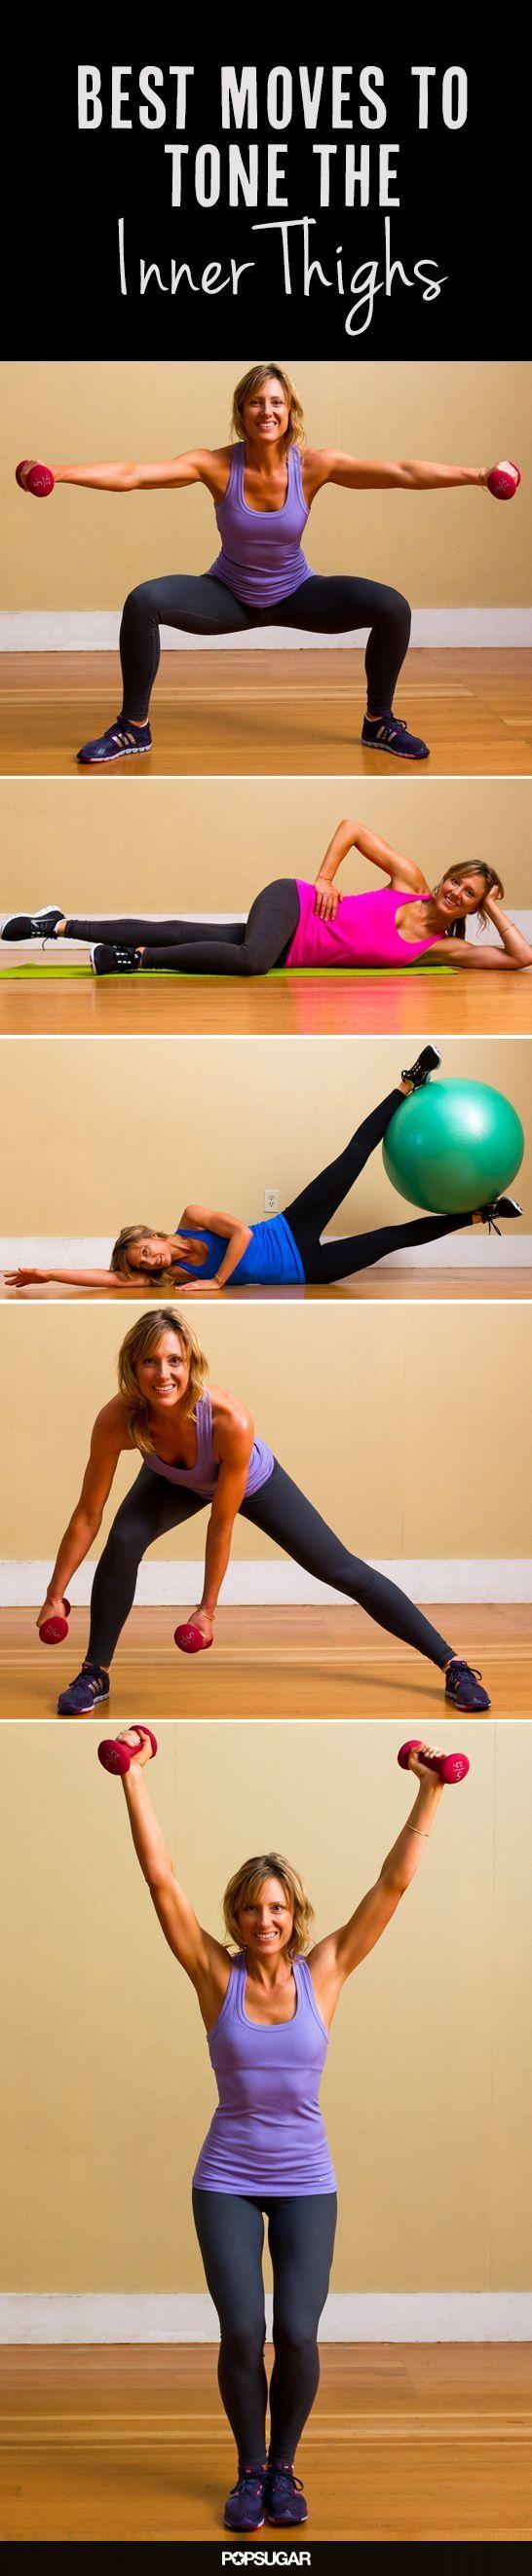 All Time Best Inner Thigh Exercises